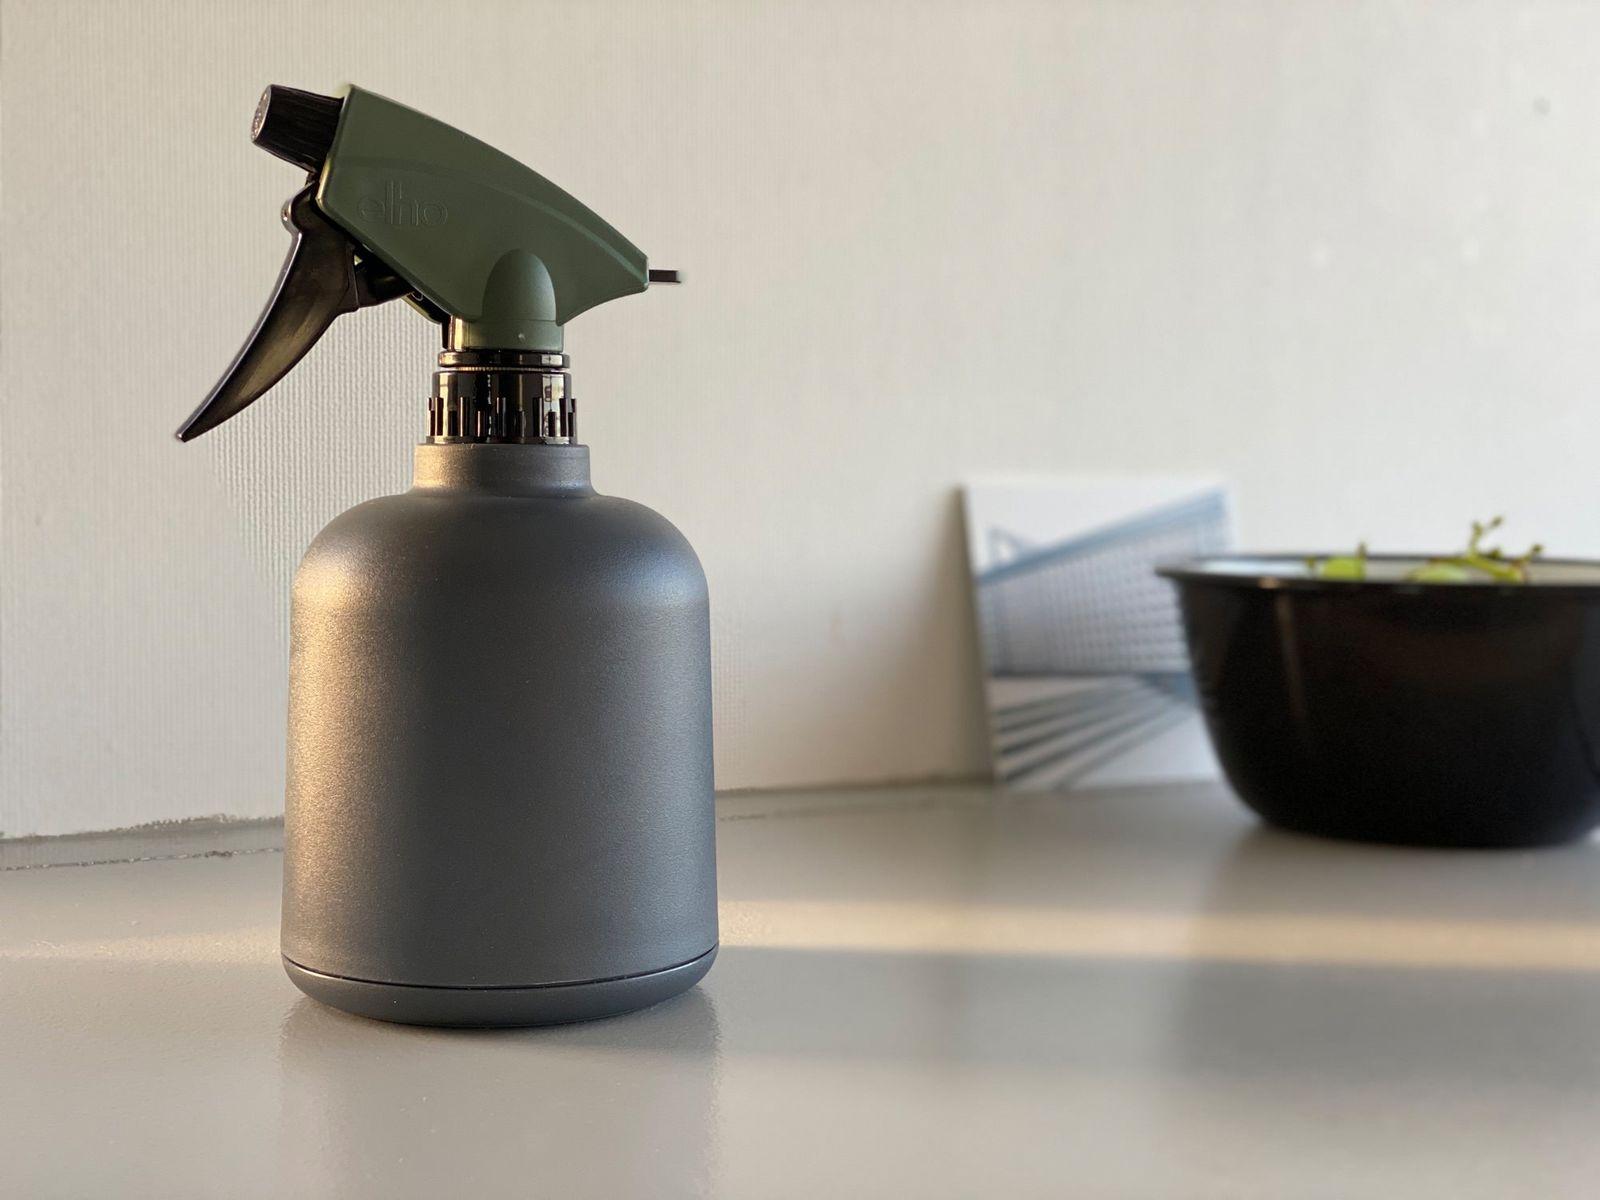 Camping/ Hygiene